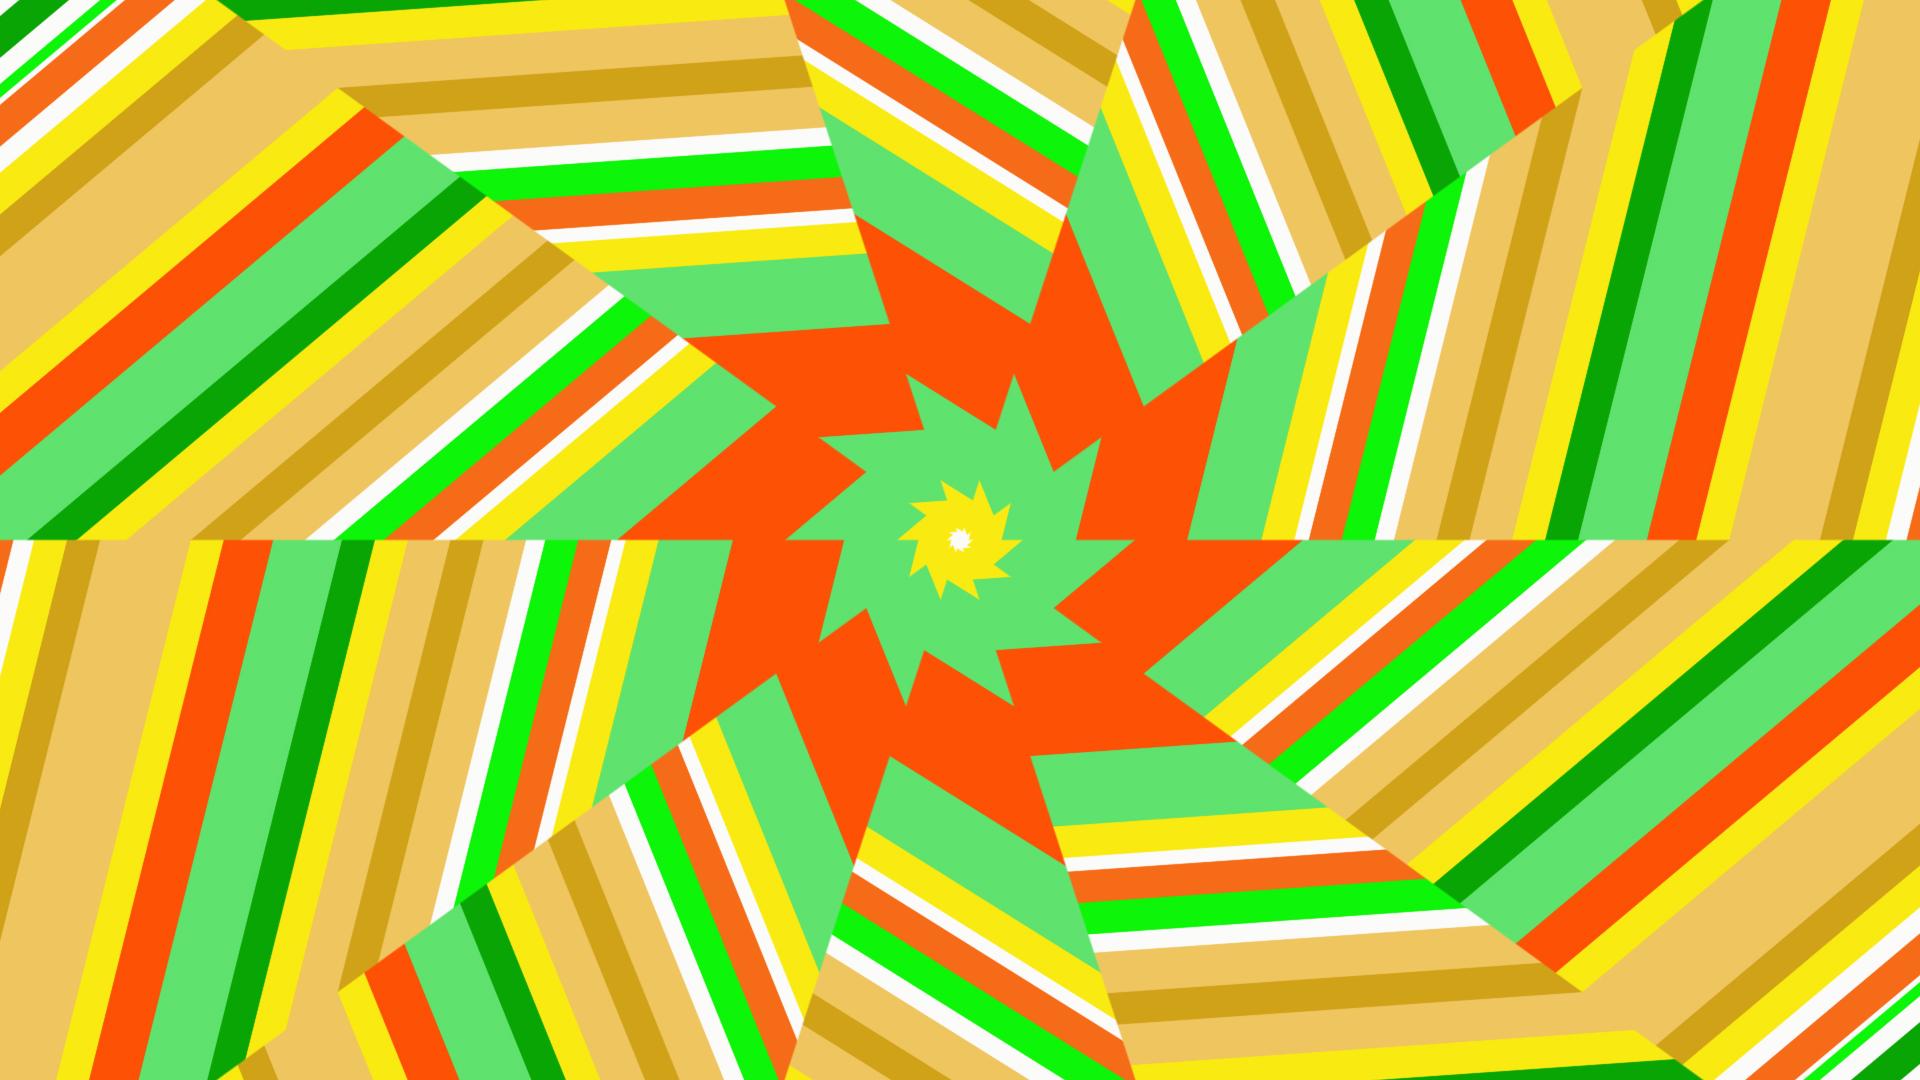 Artistic Digital Art Colorful Lines Shapes Geometry 1920x1080